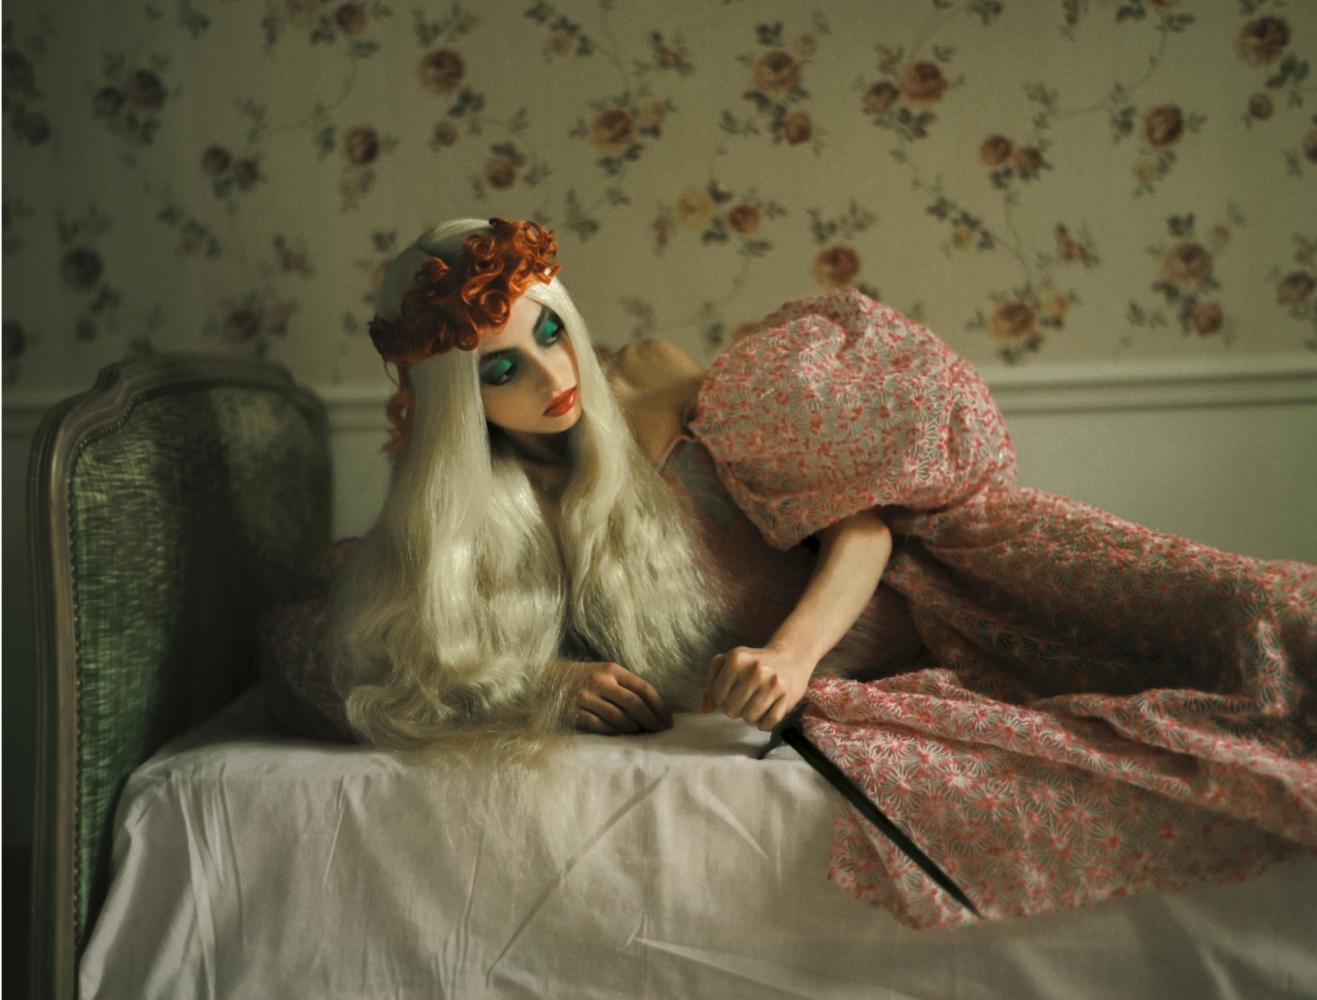 Clara for NUMERO NL shot by Fee-Gloria Groenemeyer